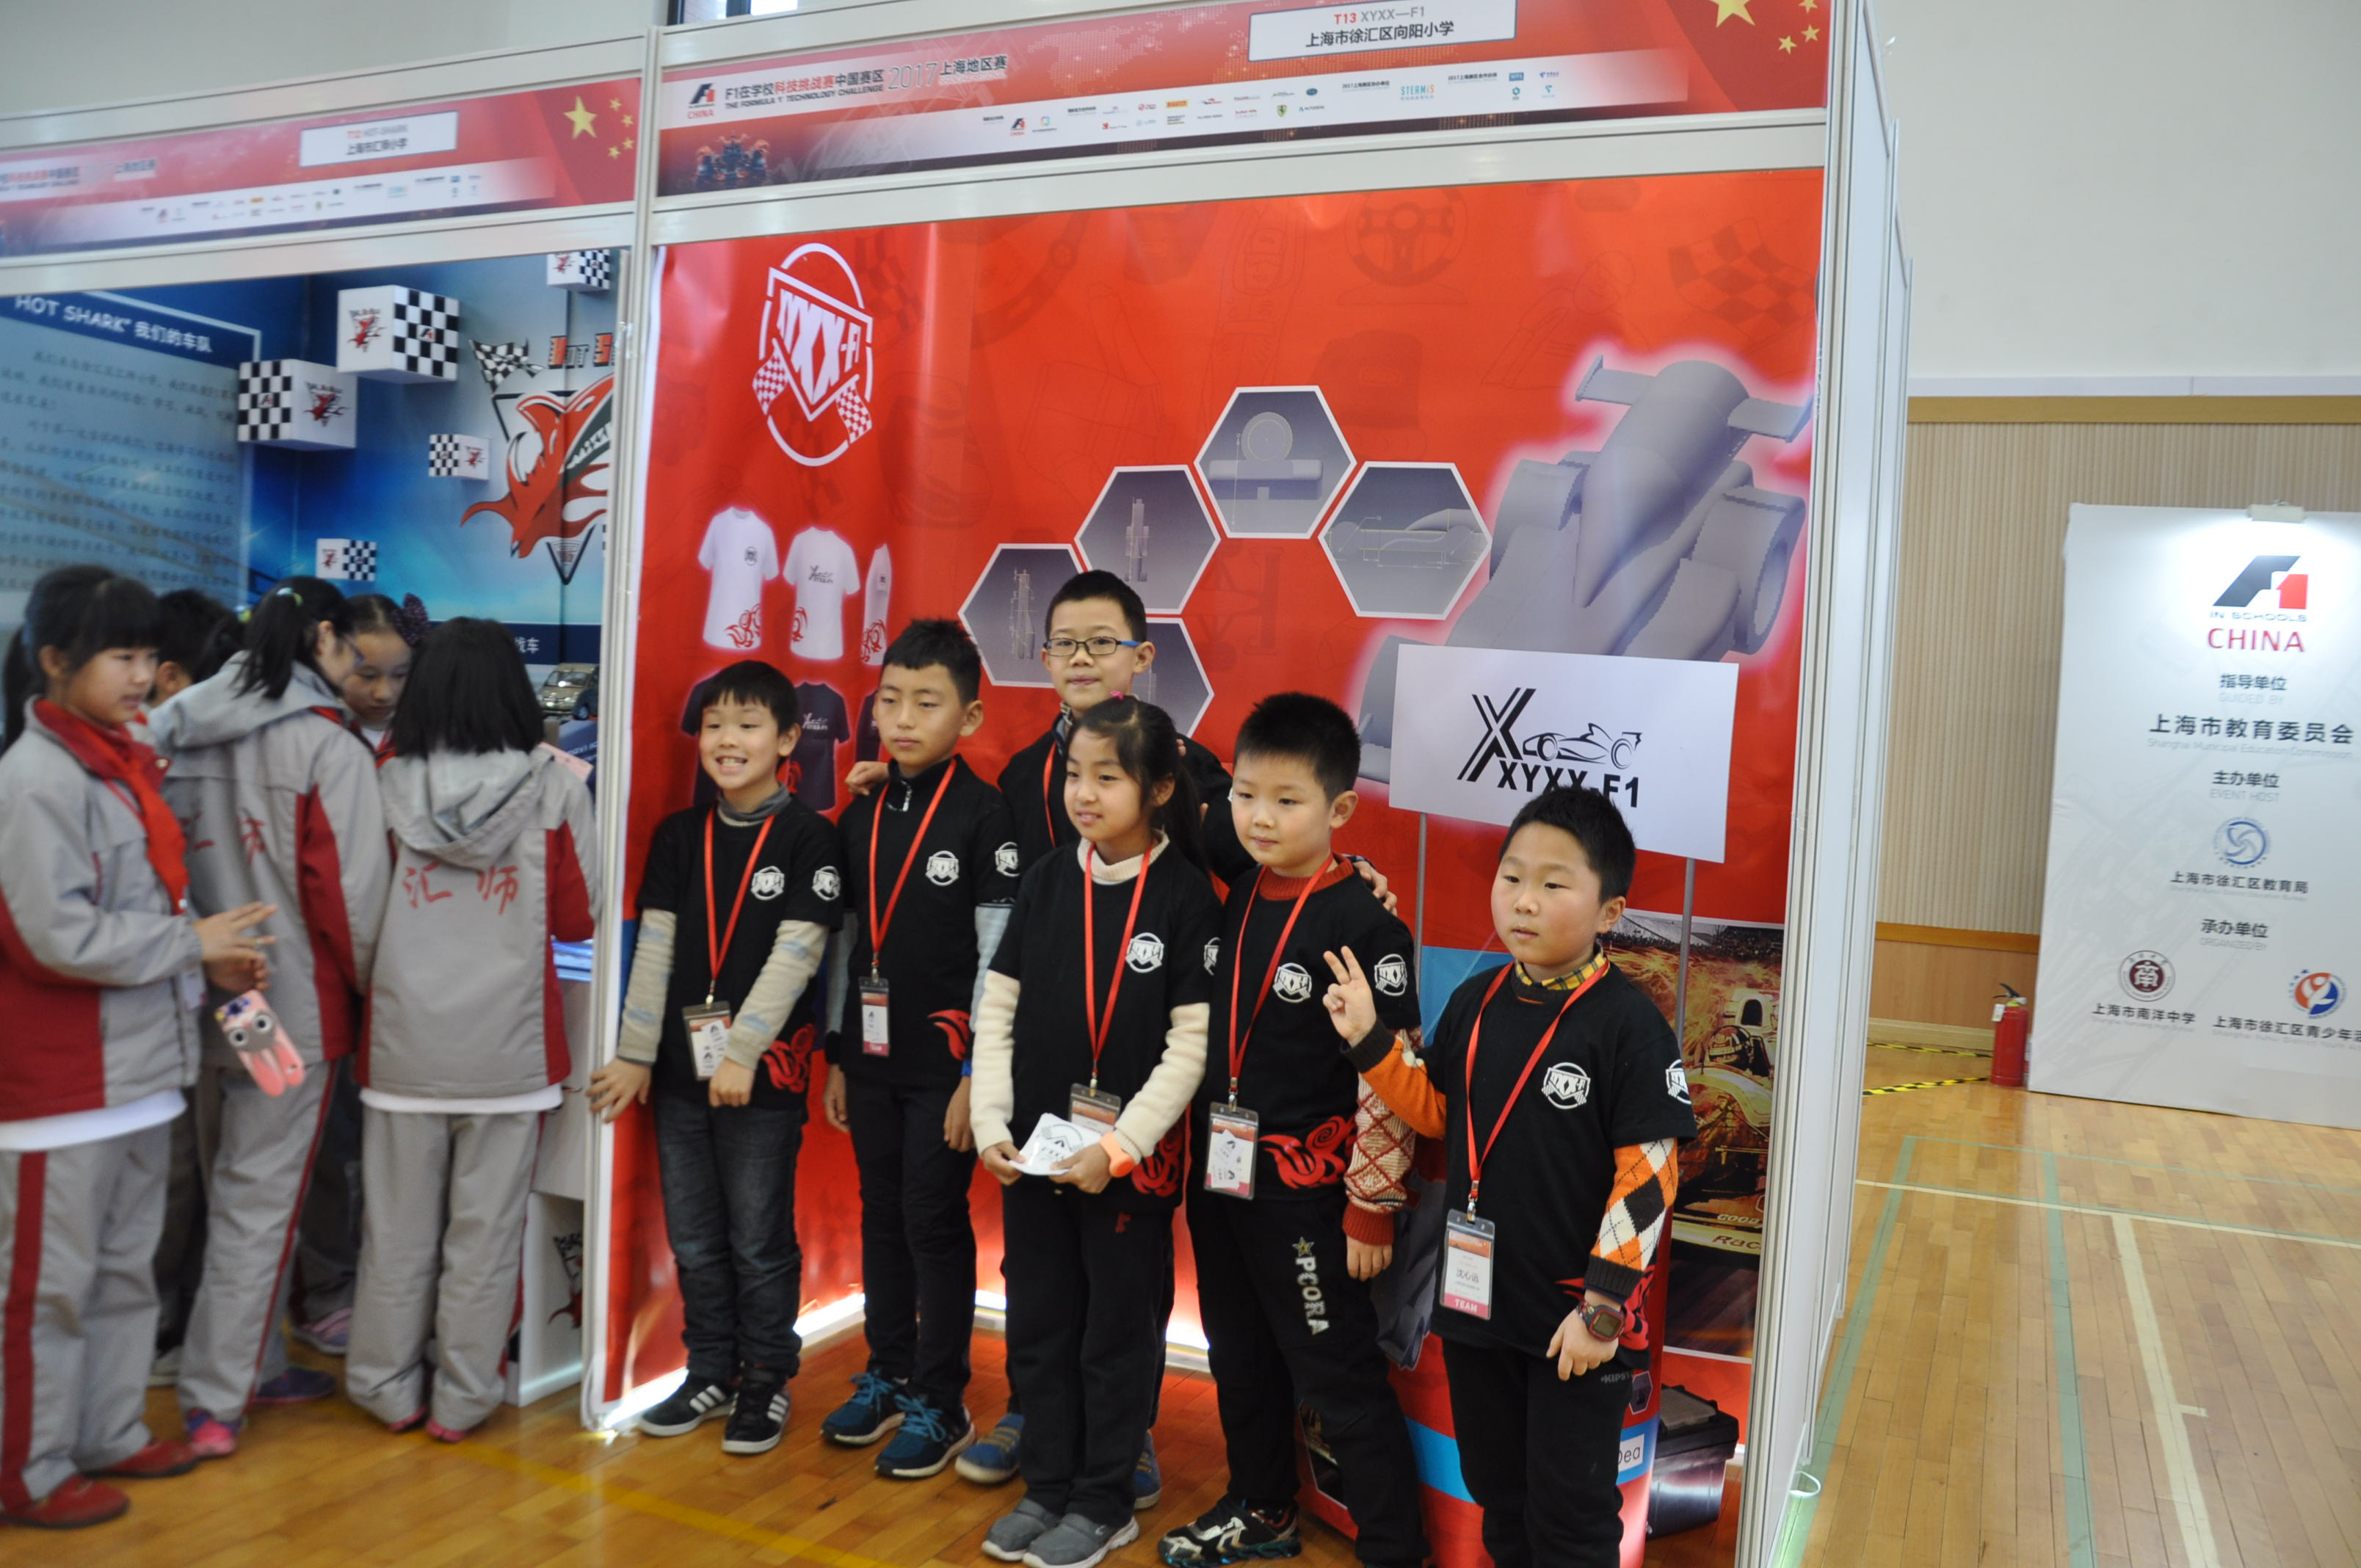 """F1在学校""2017上海地区赛正式开幕"